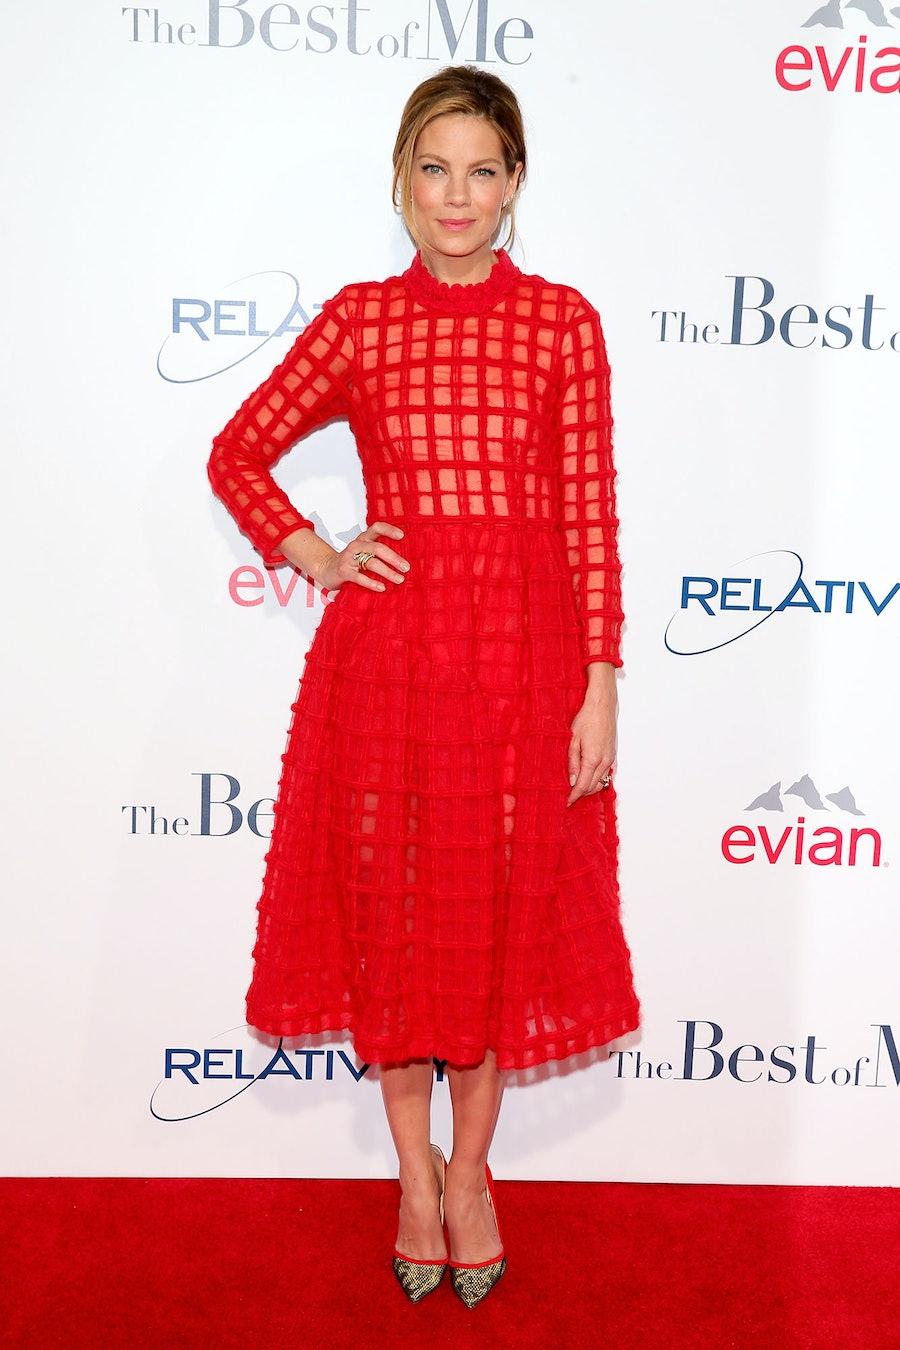 Michelle Monaghan in Simone Rocha